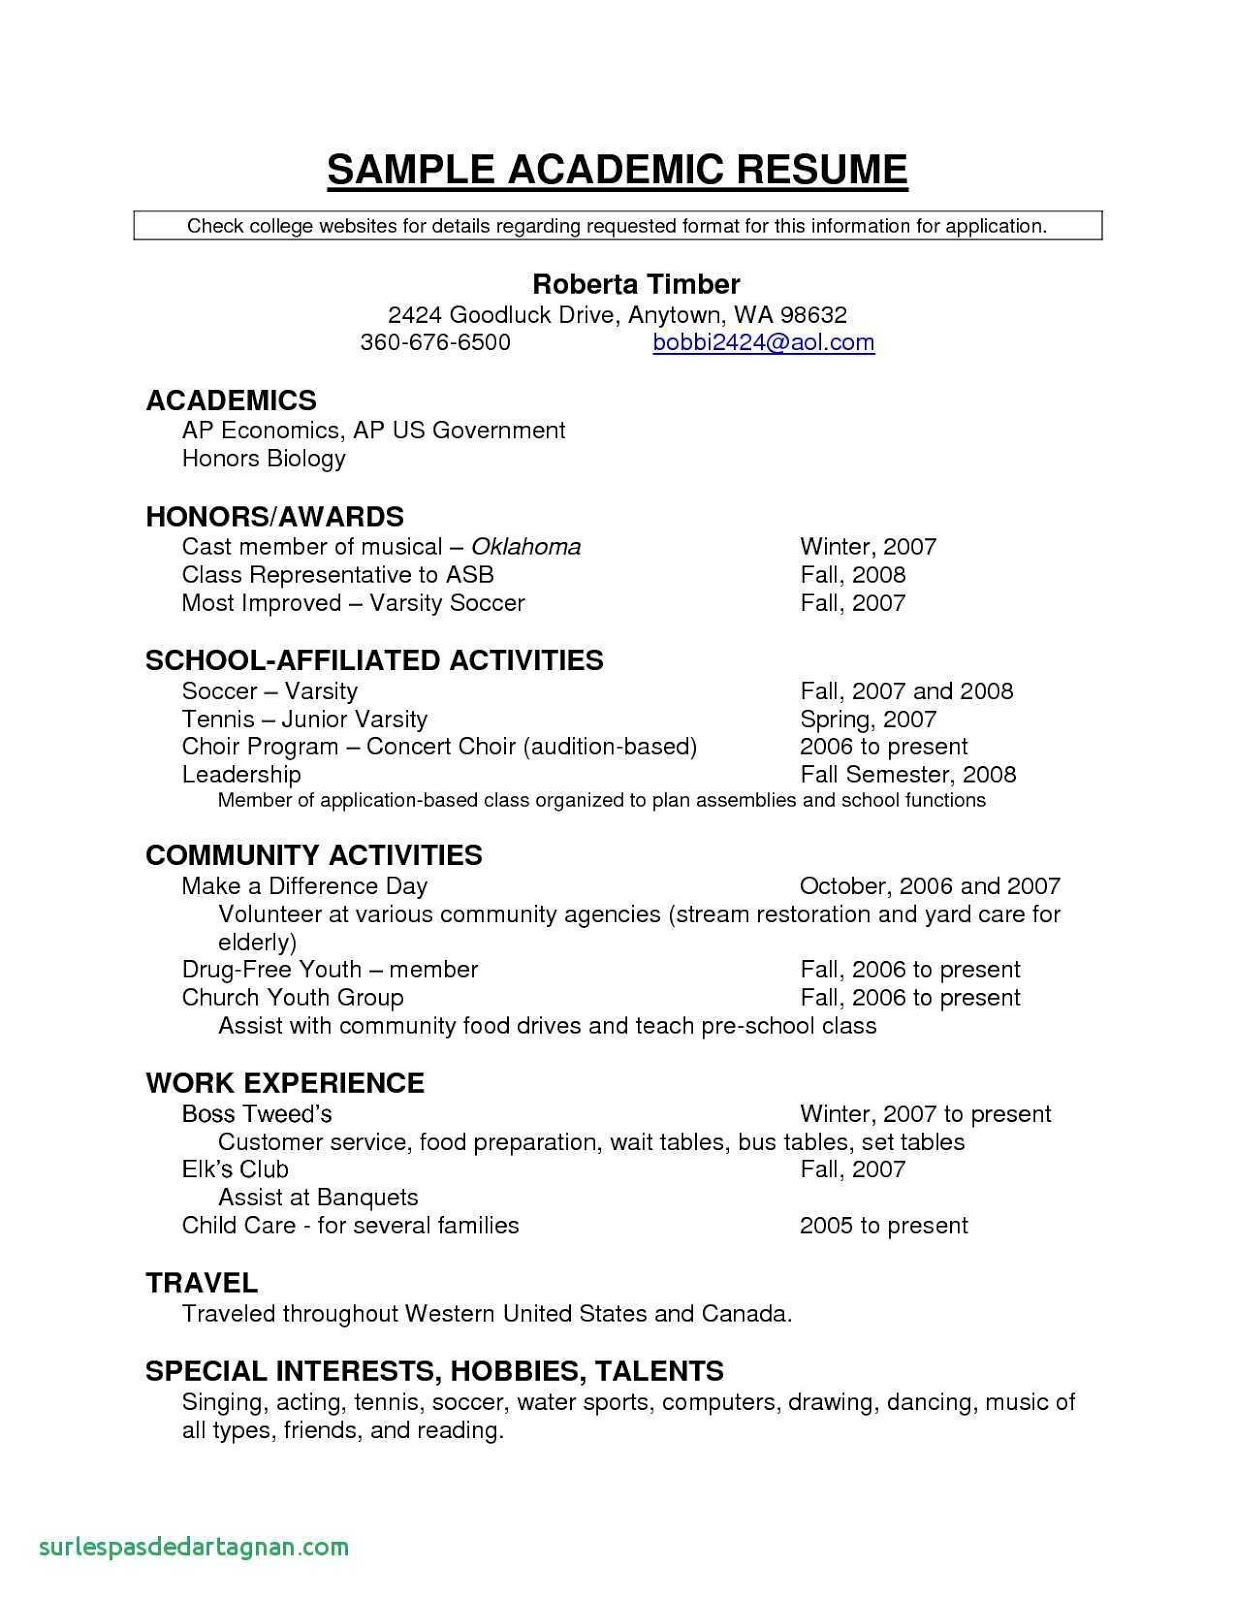 Basic Resume Format 2019 Basic Resume Format Examples 2020